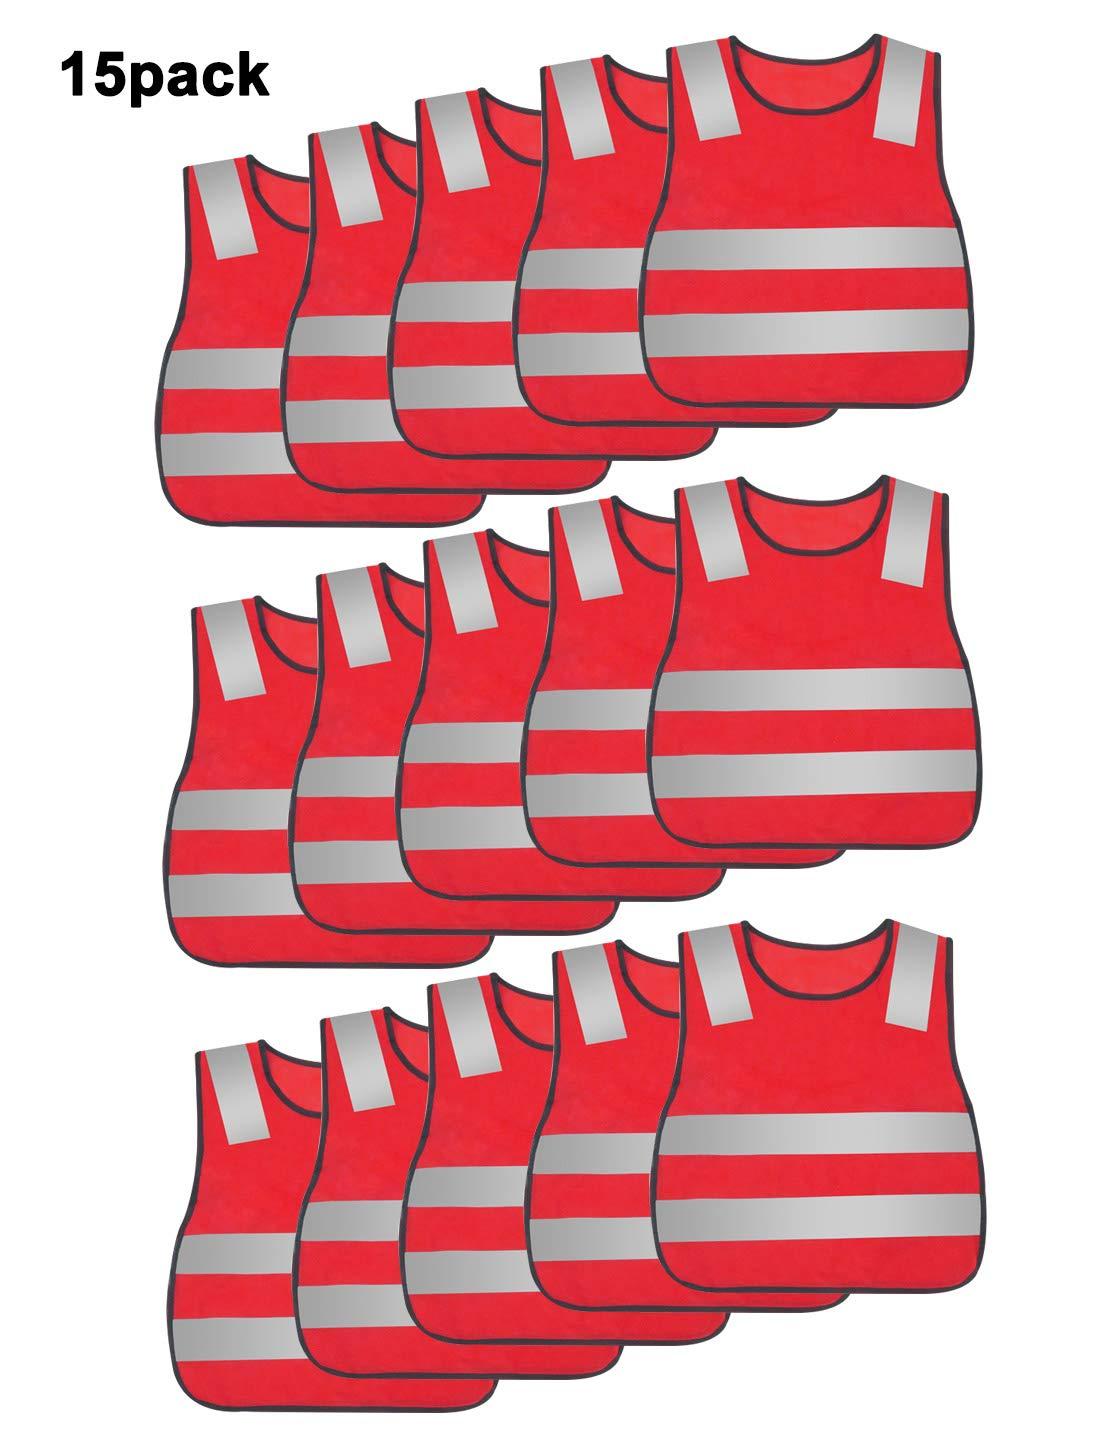 Kids High Visibility Vest Mesh Safety Vest Reflective Construction Vest Traffic Work Vest Industrial Vest Emergency Vest With Elastic Waistband Neon Red 15PCS